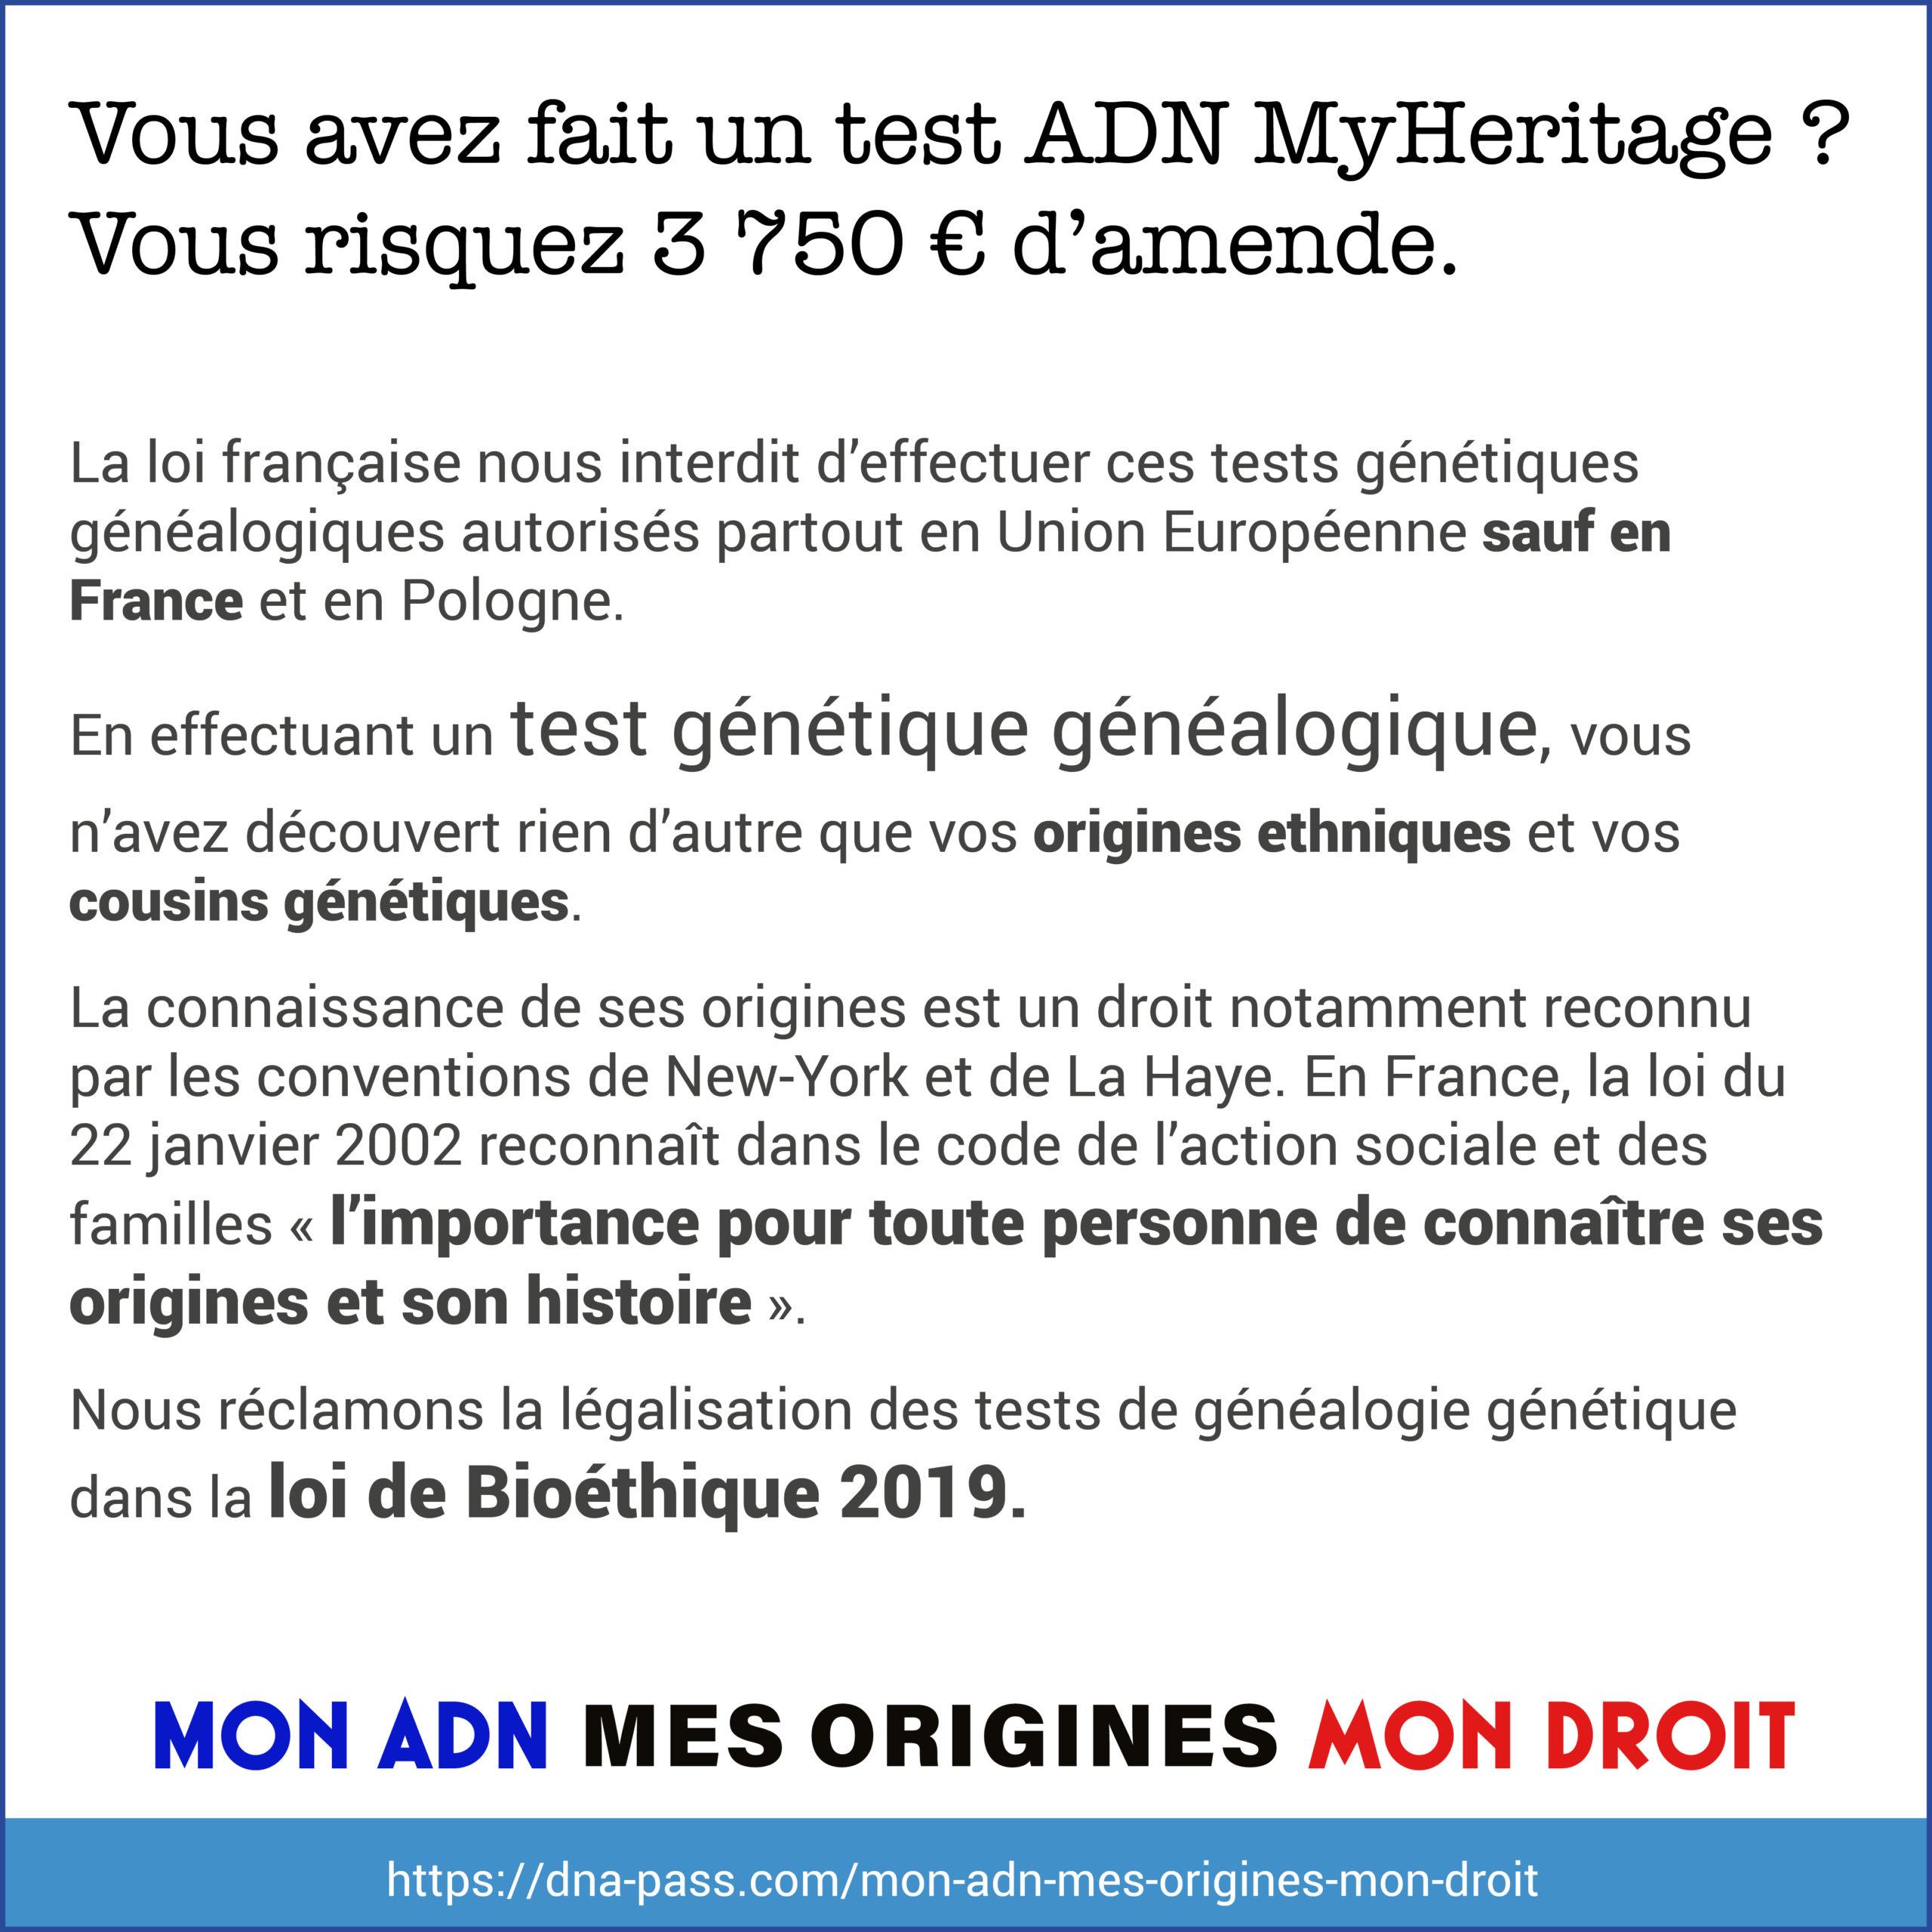 J'ai fait un test ADN MyHeritage, je risque 3750 euros d'amende